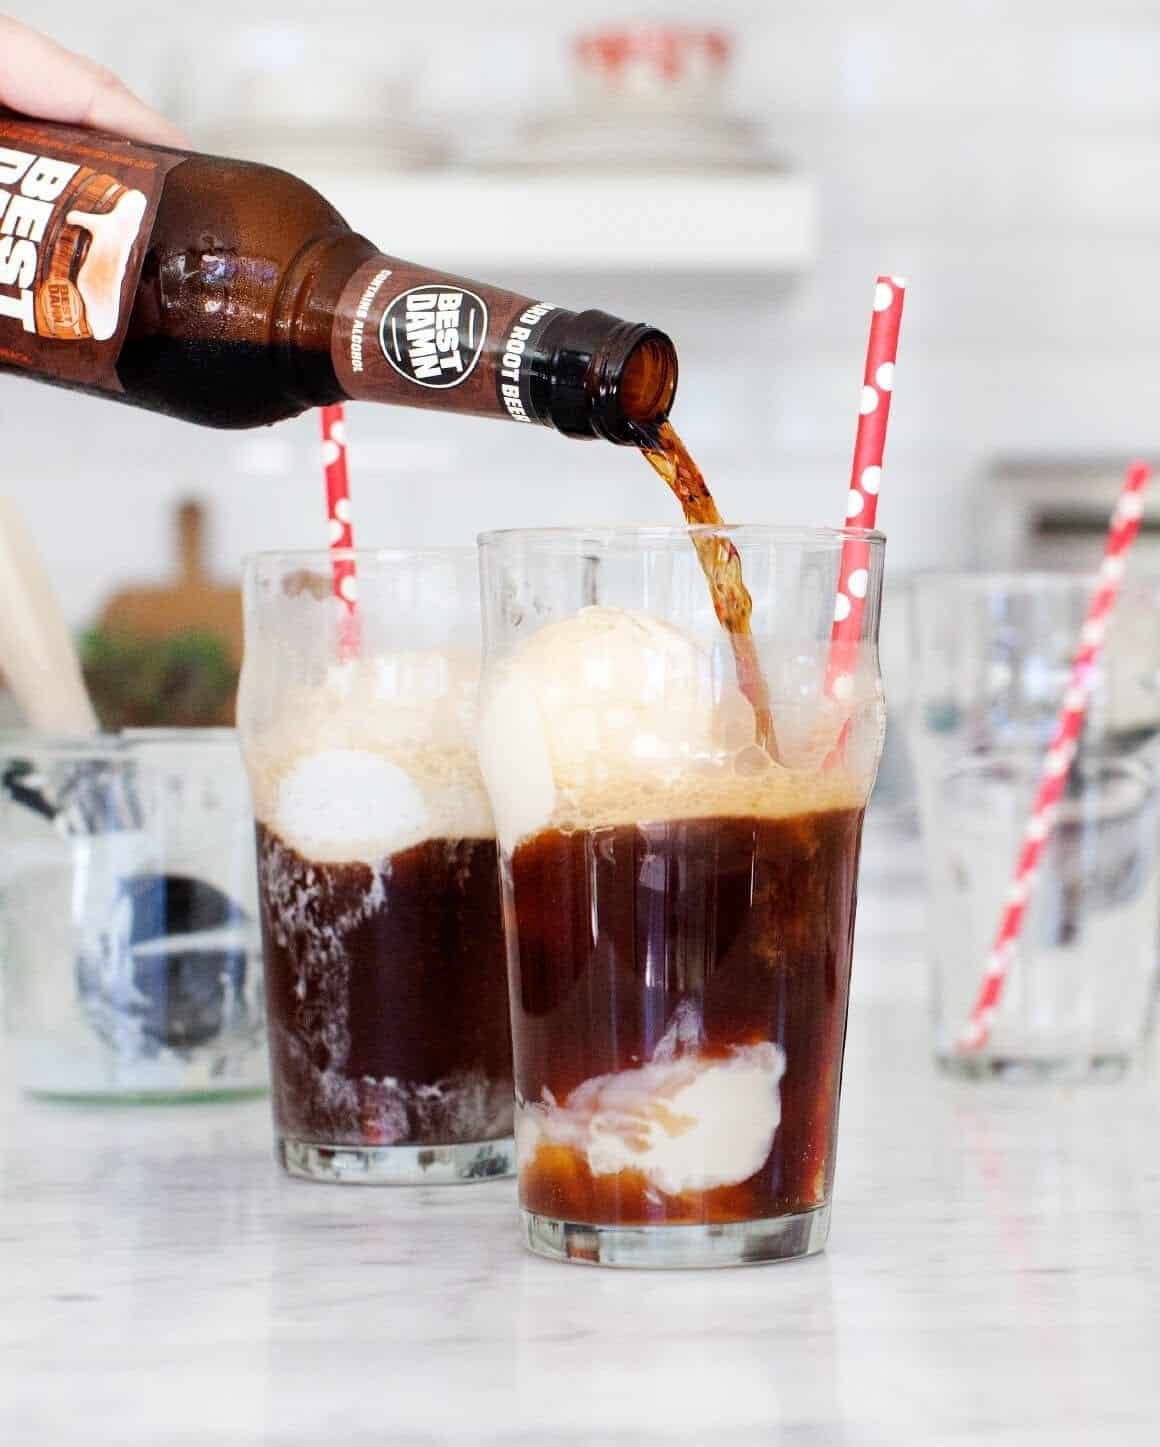 Boozy Root Beer Floats with homemade vegan vanilla ice cream